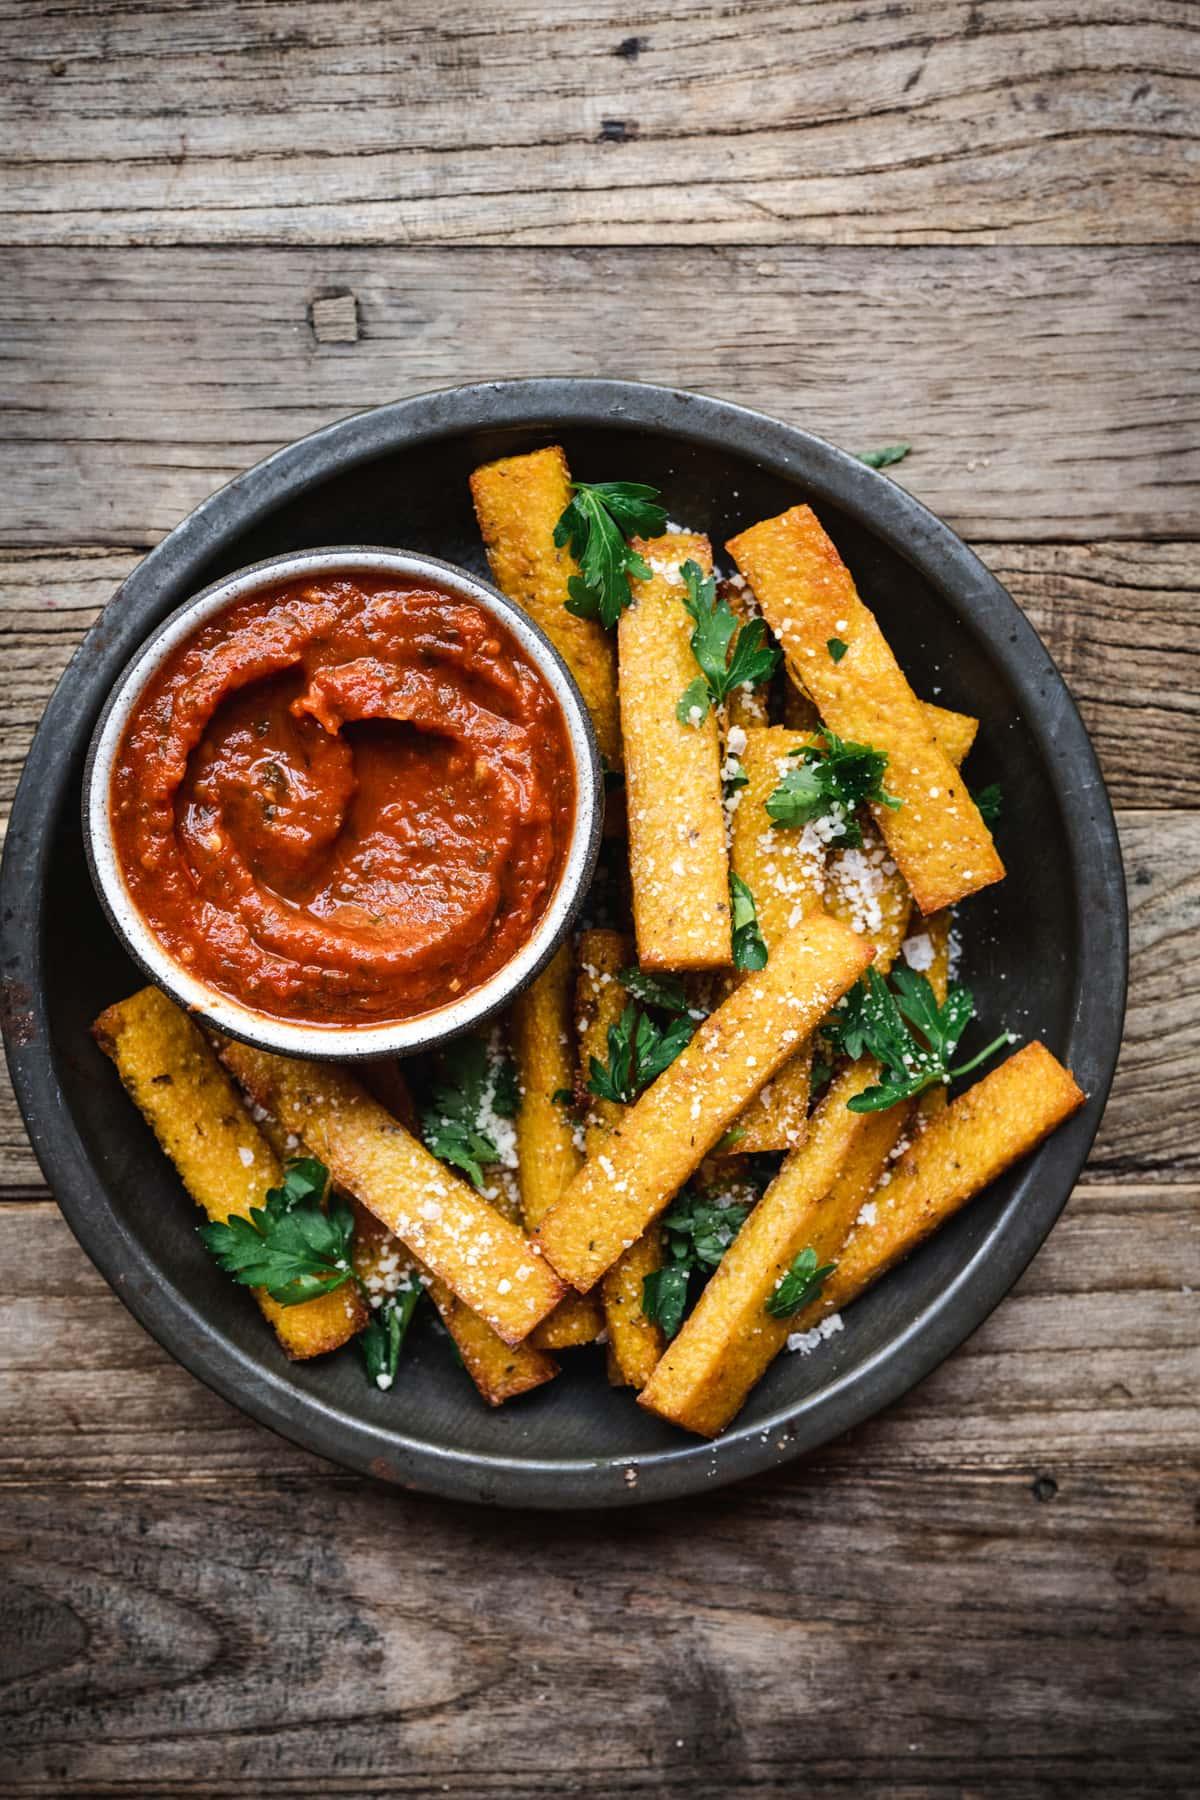 overhead of vegan polenta fries in a serving dish with marinara sauce